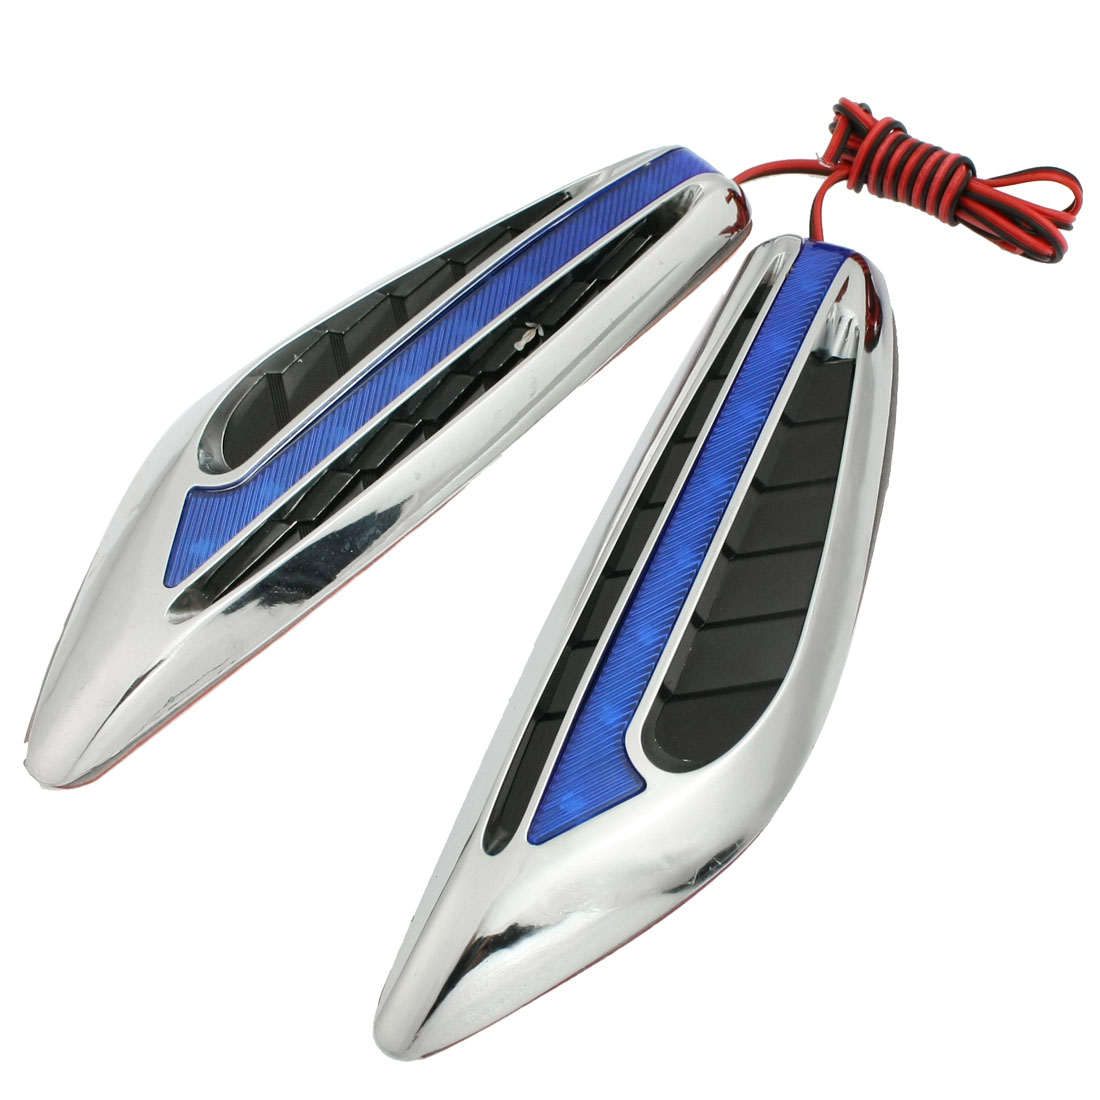 2 Pcs DC 12V Blue 8 LED Blade Shape Car Turning Signal Light Lamp